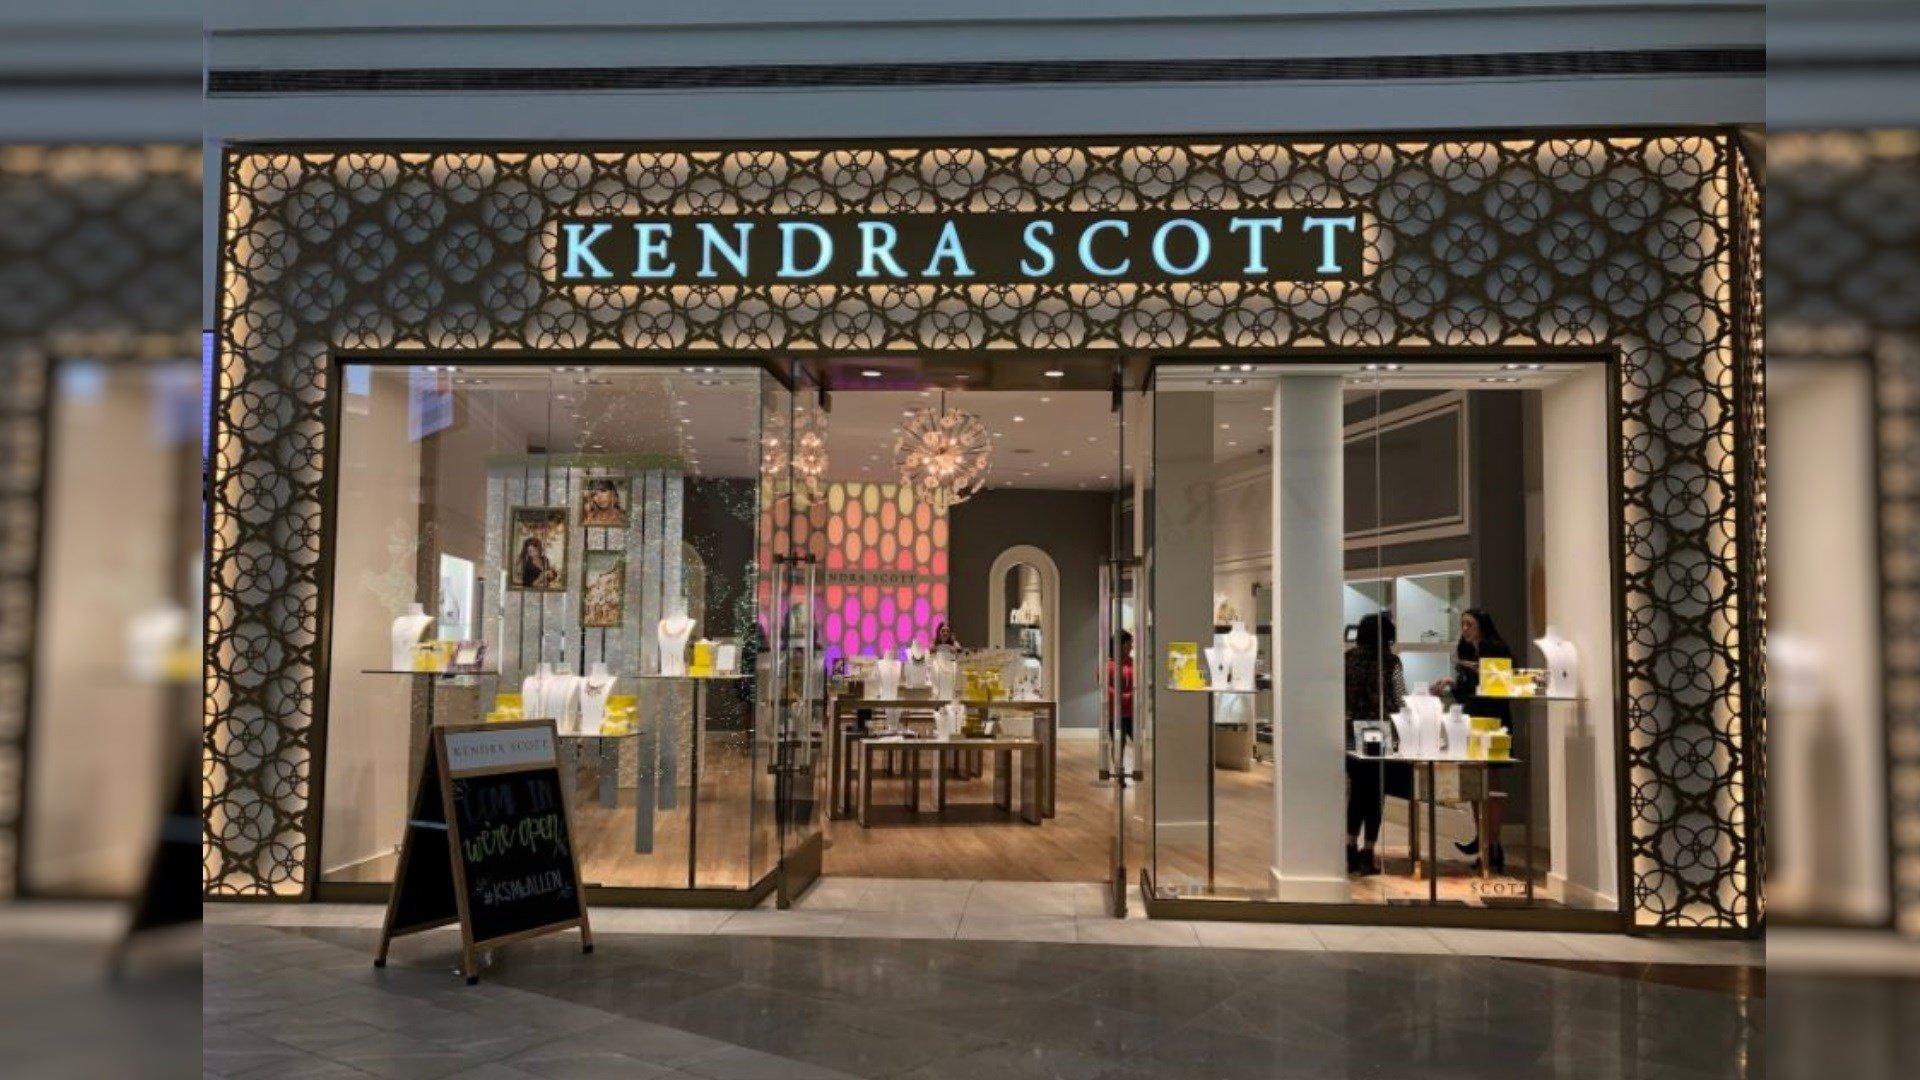 Kendra Scott's recently opened boutique in McAllen. Photo- Kendra Scott/Twitter